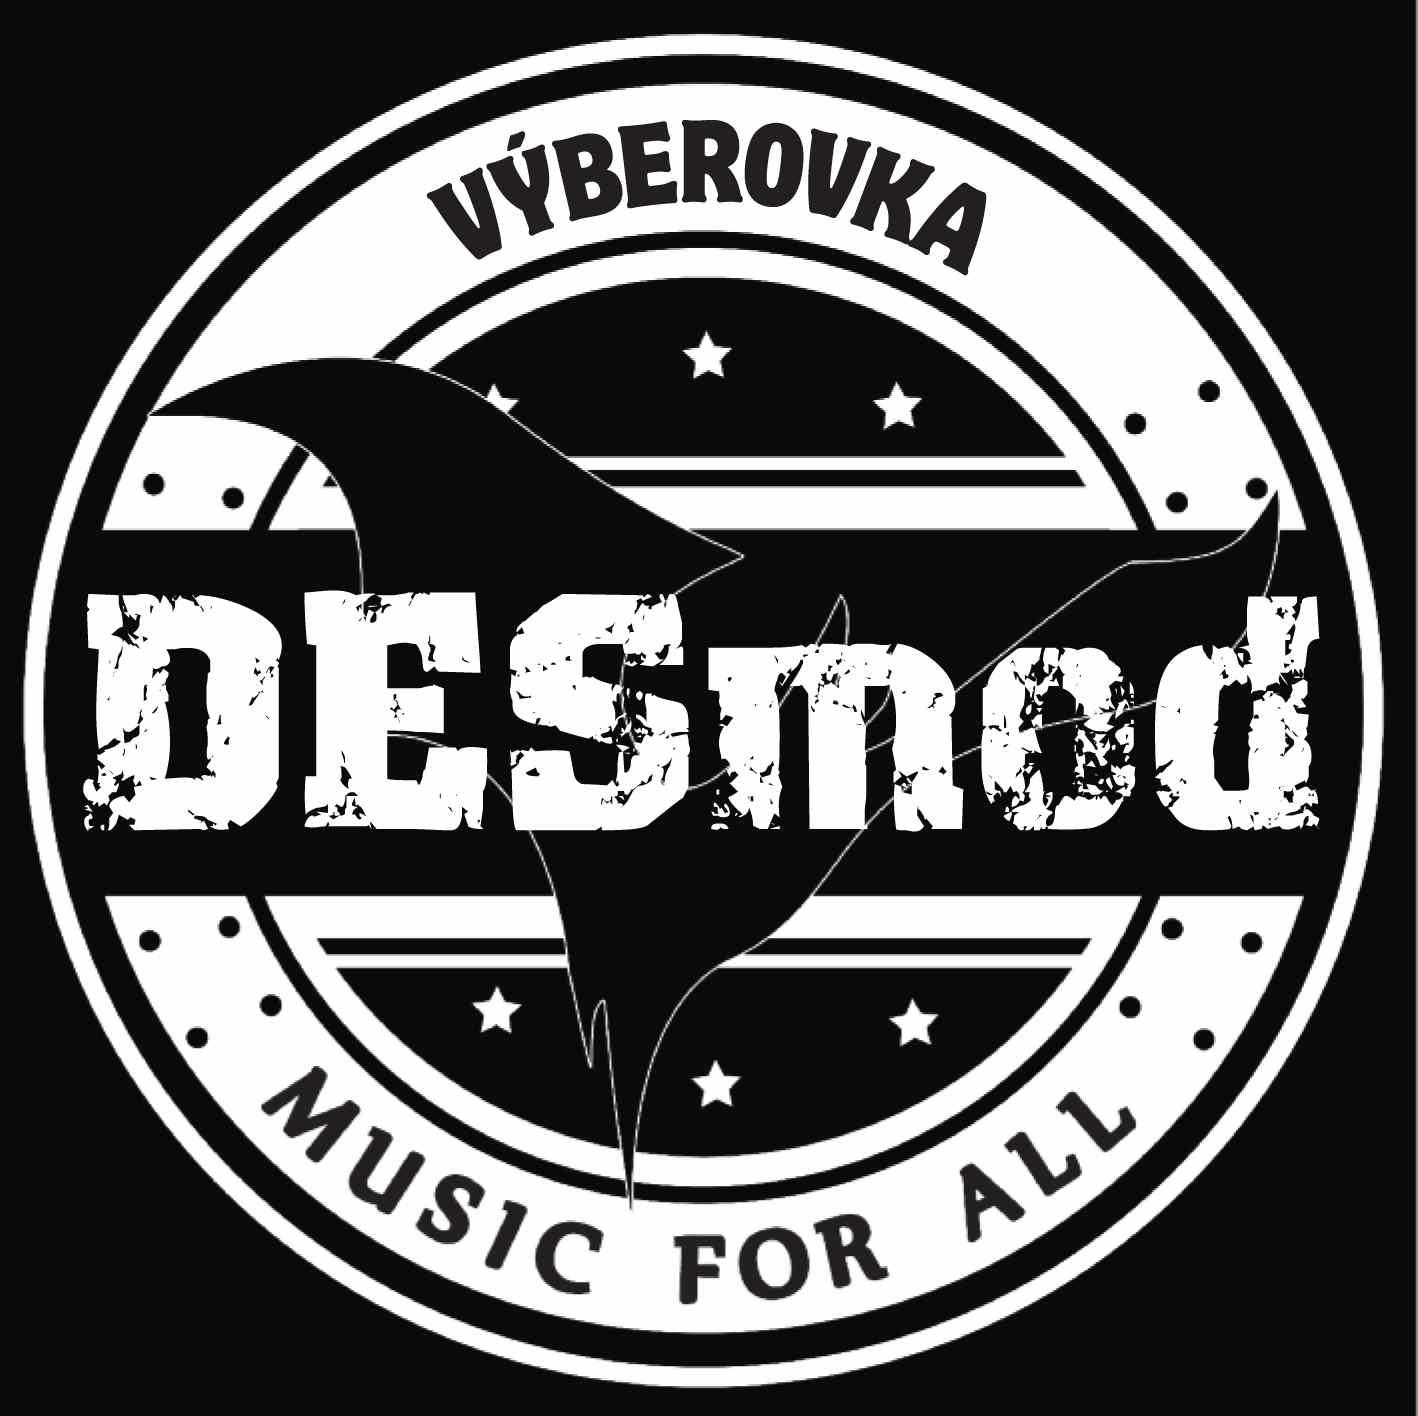 Desmod - Výberovka